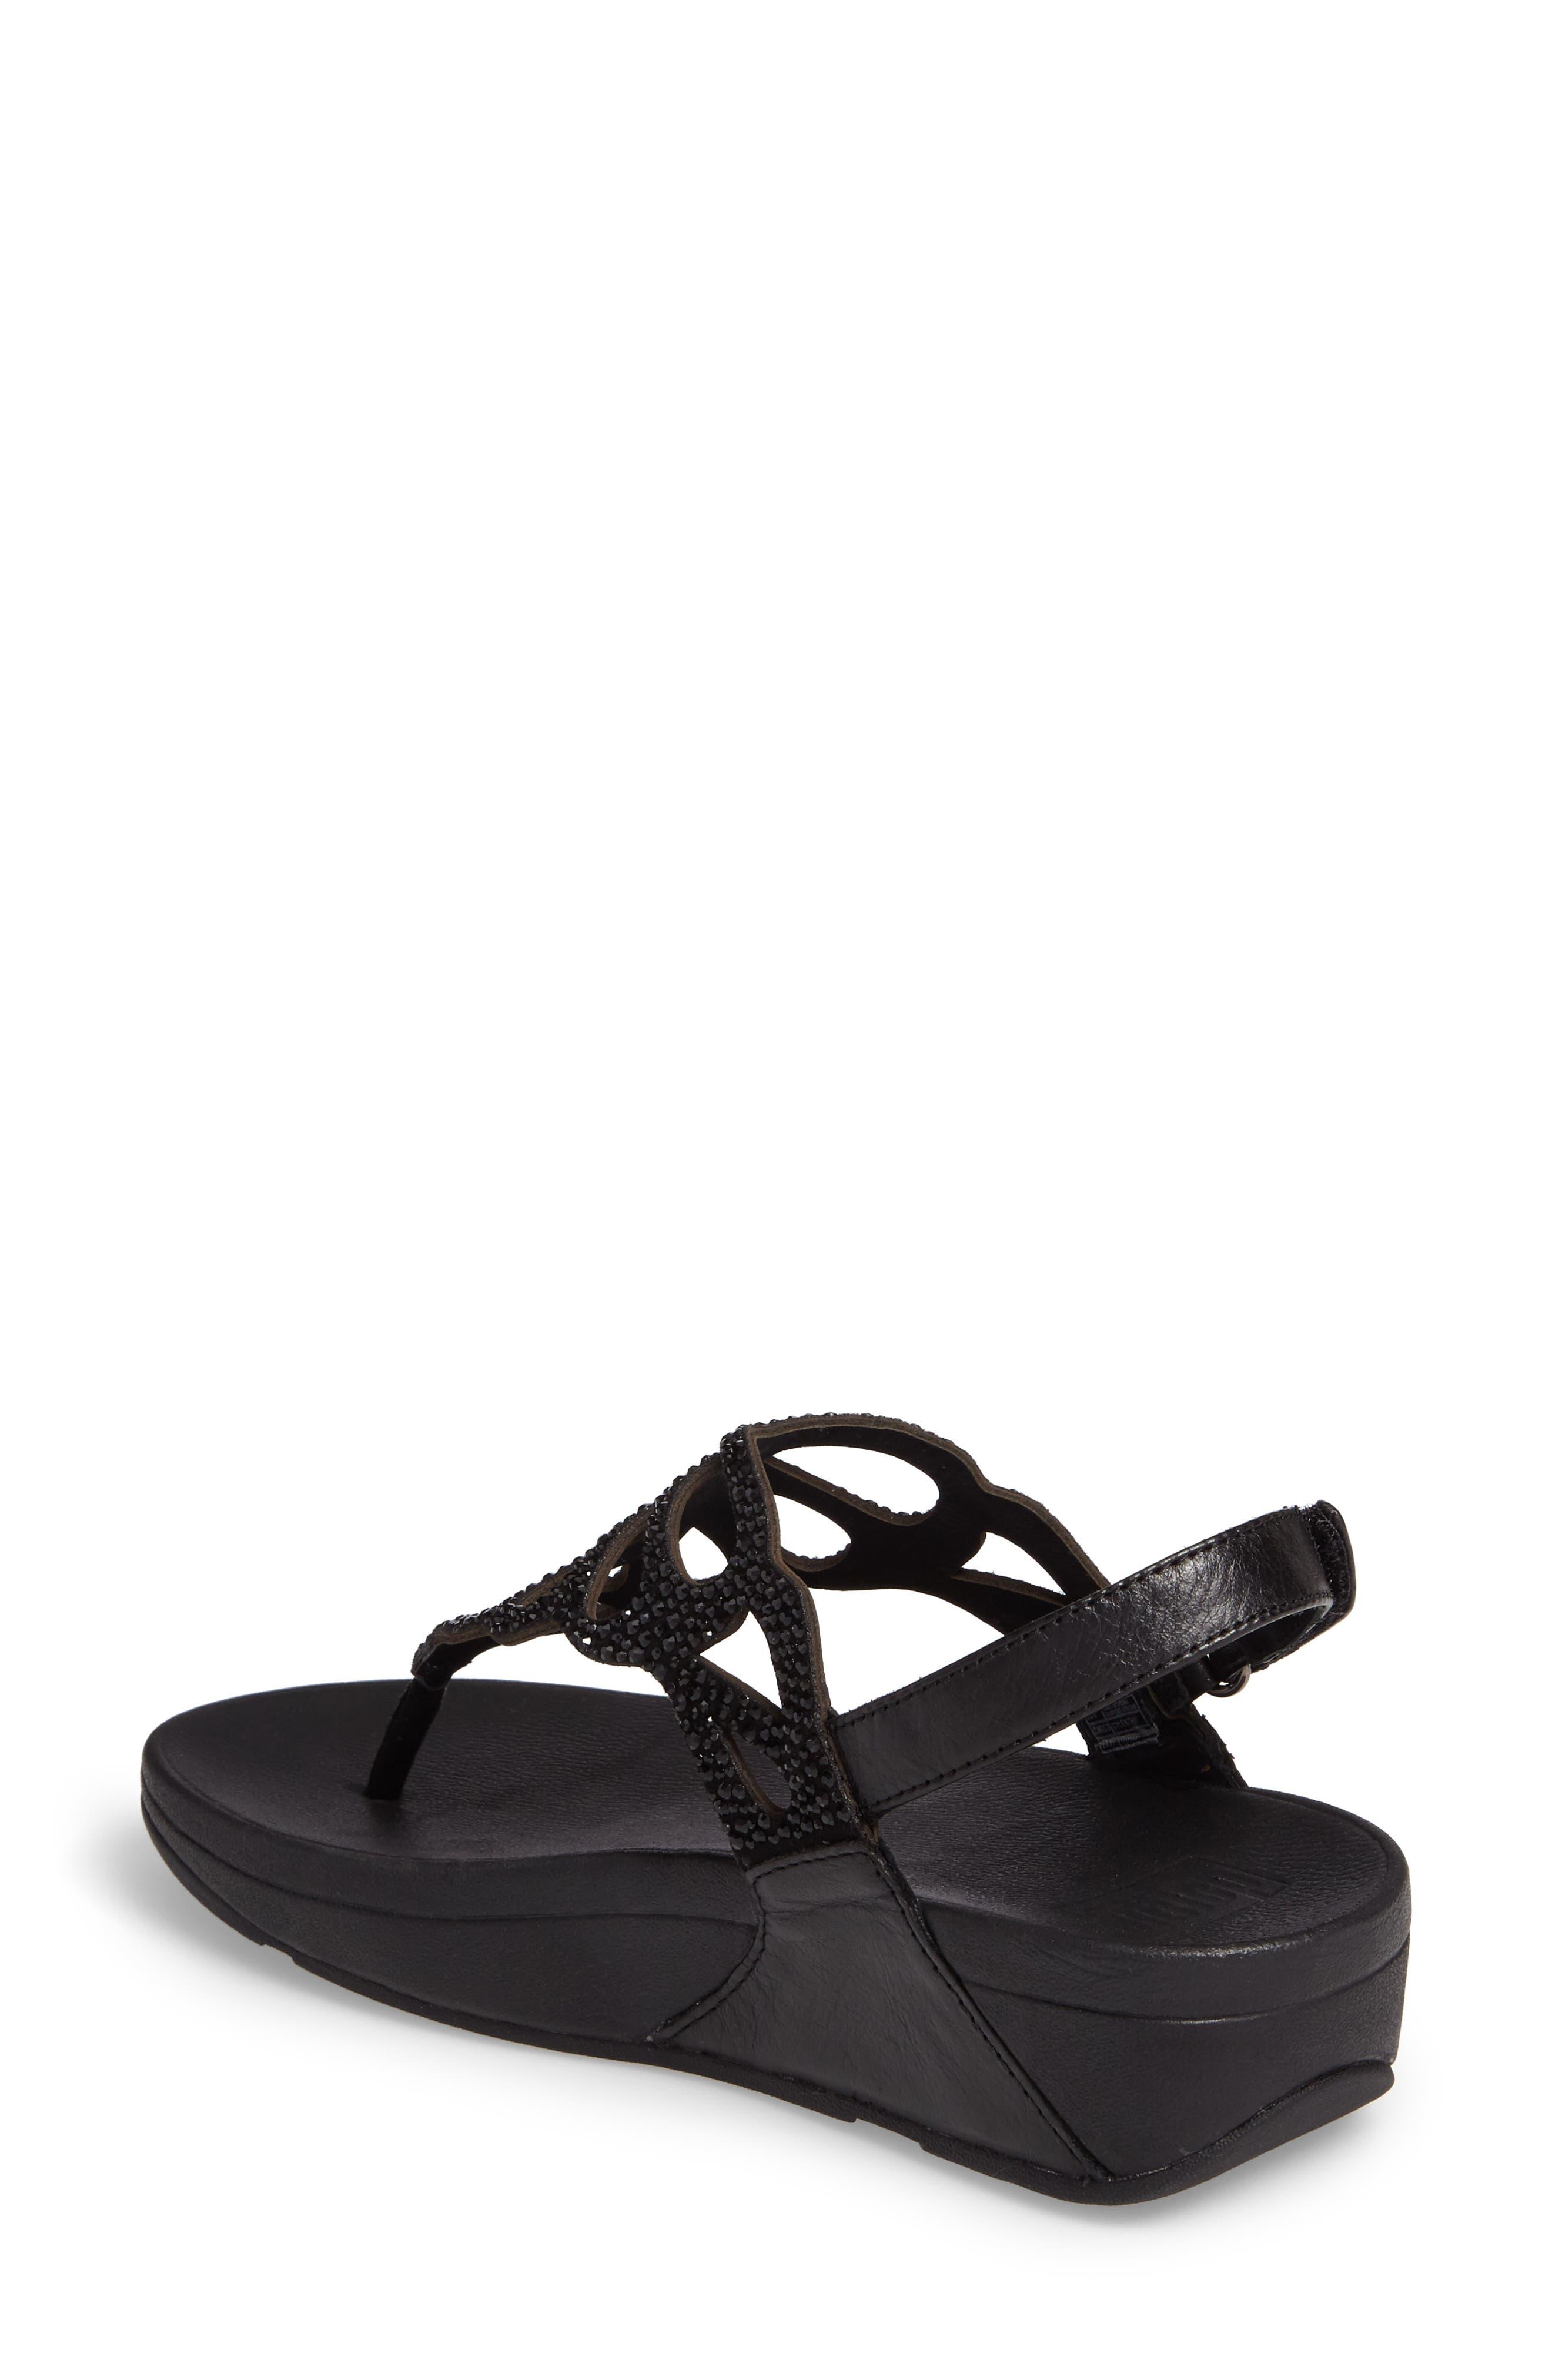 Bumble Crystal Embellished Sandal,                             Alternate thumbnail 2, color,                             Black Leather